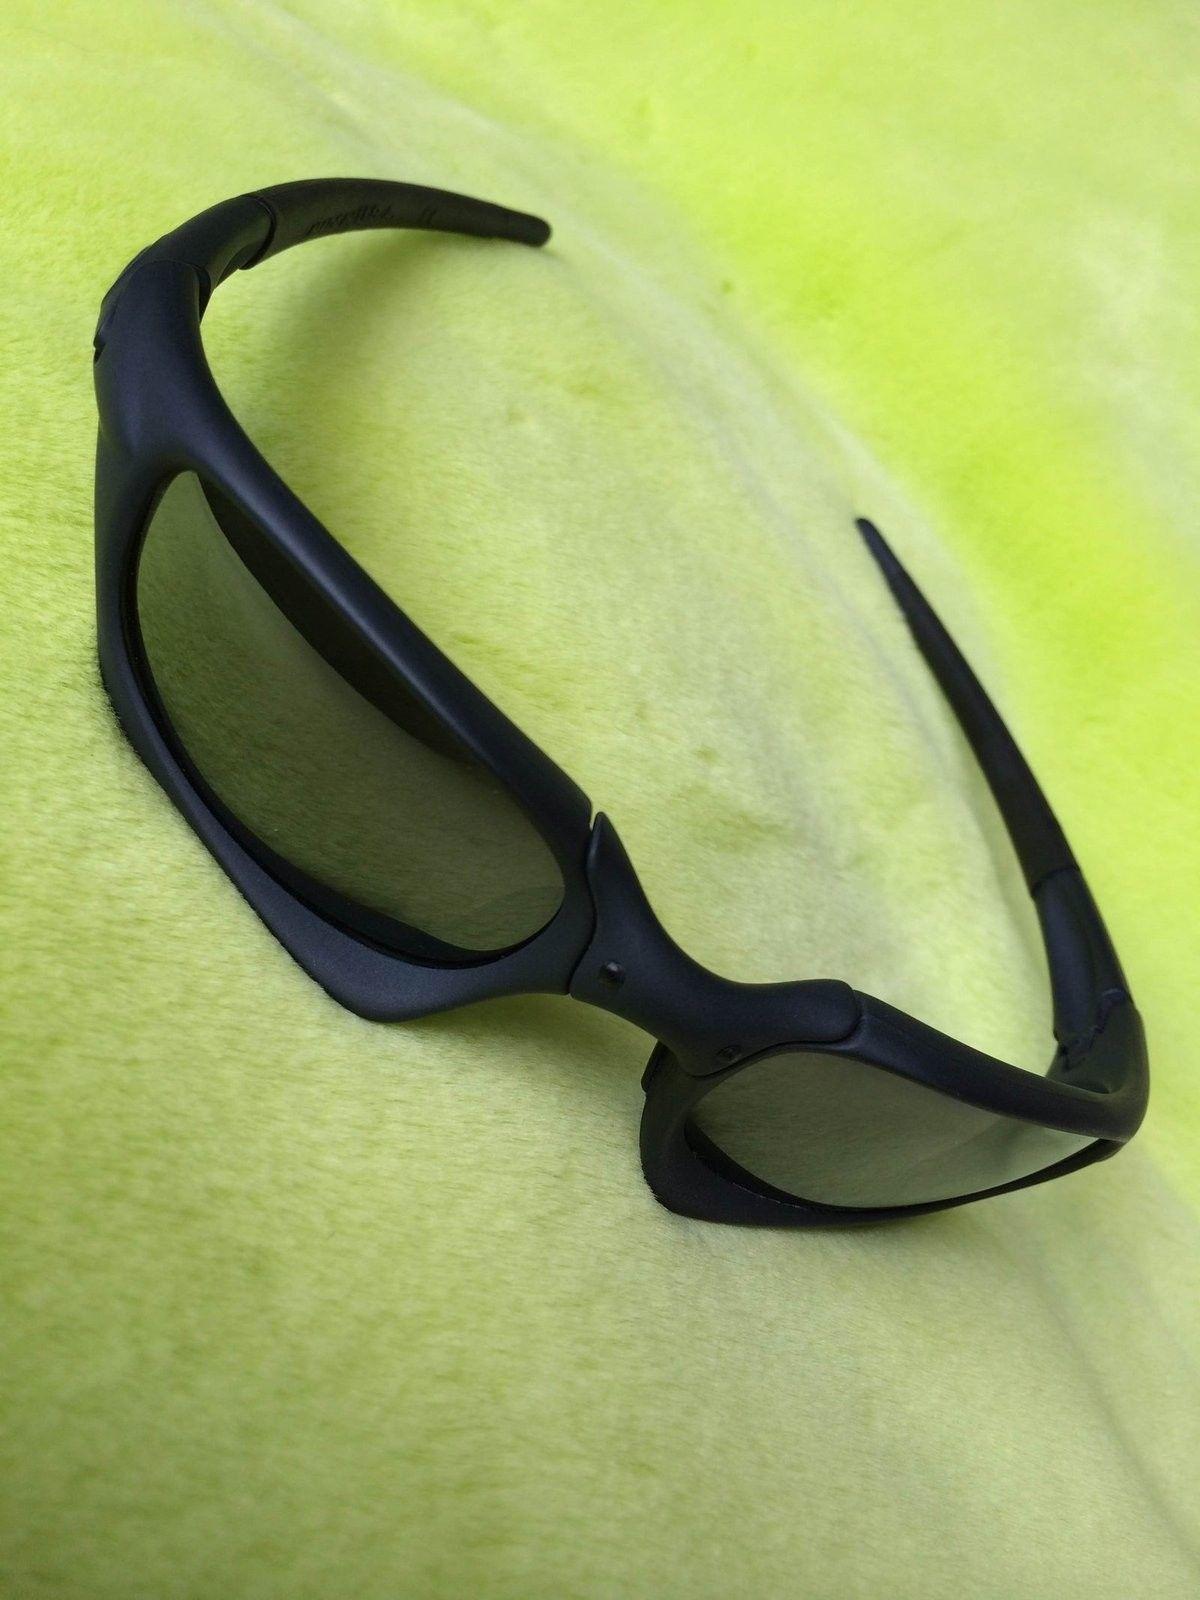 Dark Carbide frame Mag Switch w/Black Iridium lenses - with box - IMG_6005.JPG